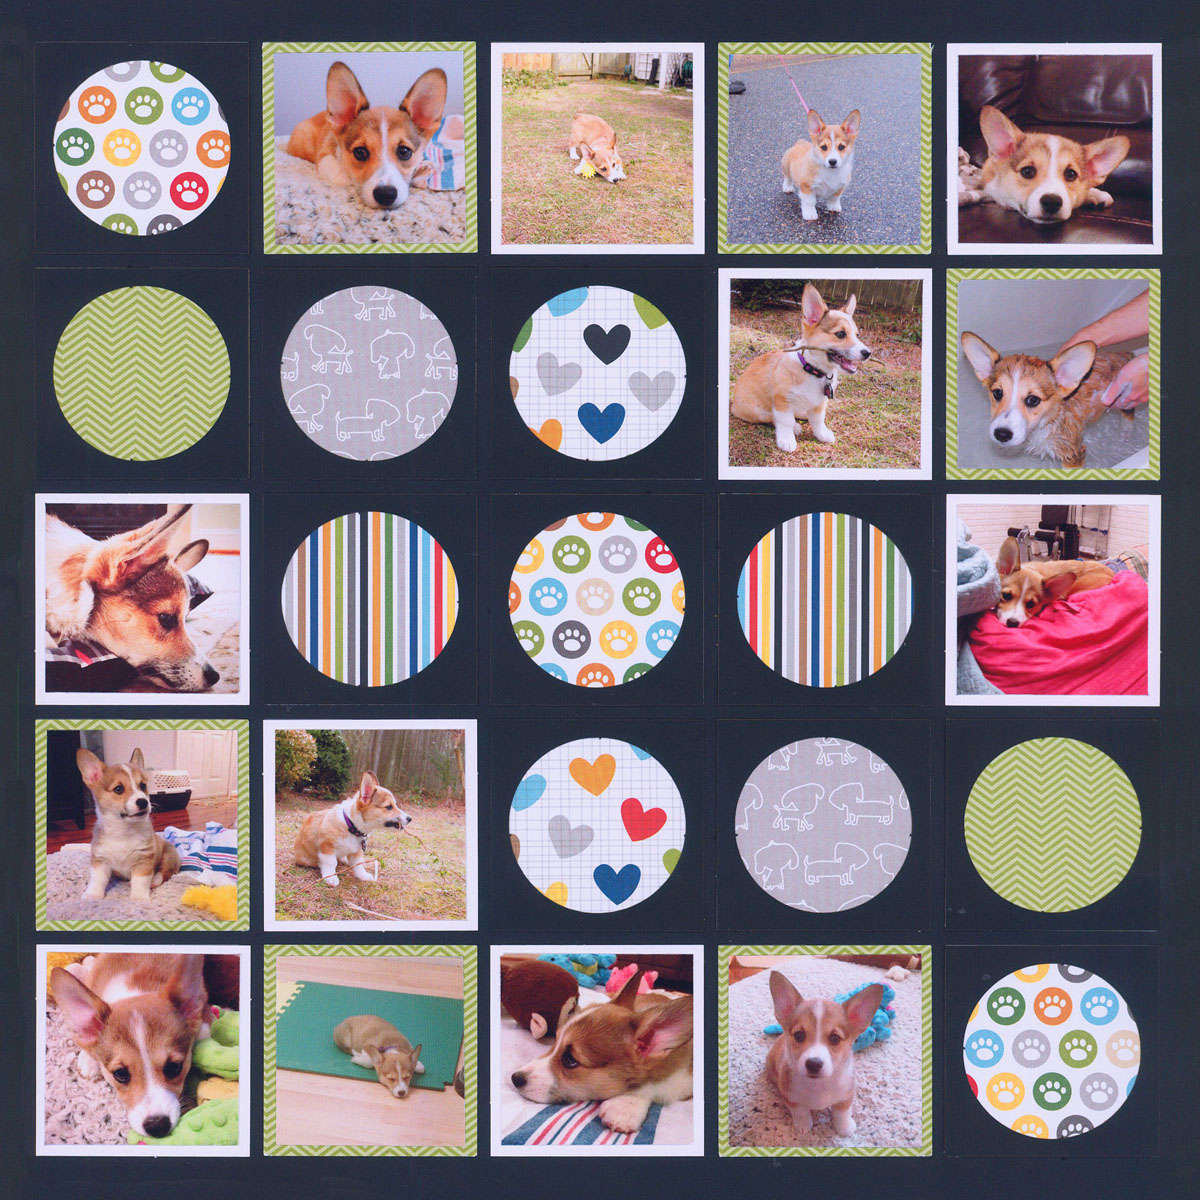 Scrapbook border ideas - Scrapbook Layout Idea Use Circle Tiles